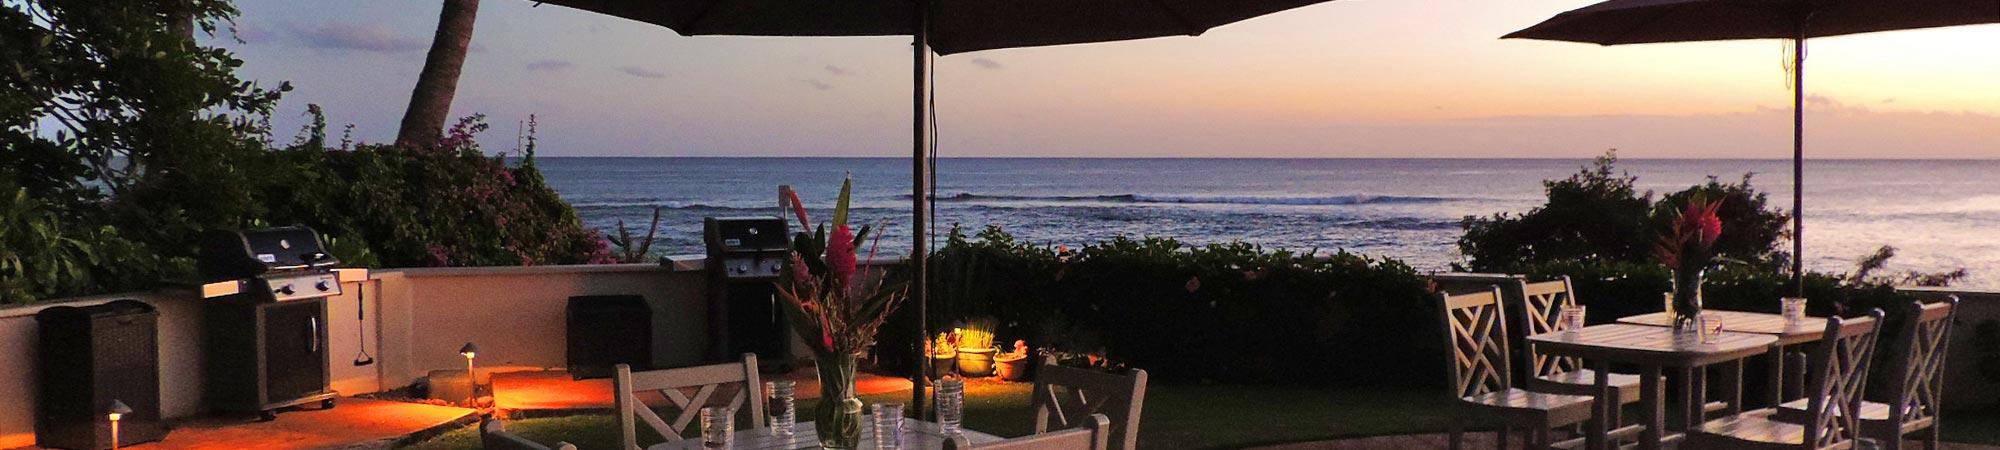 alihi lani poolside tables sunset